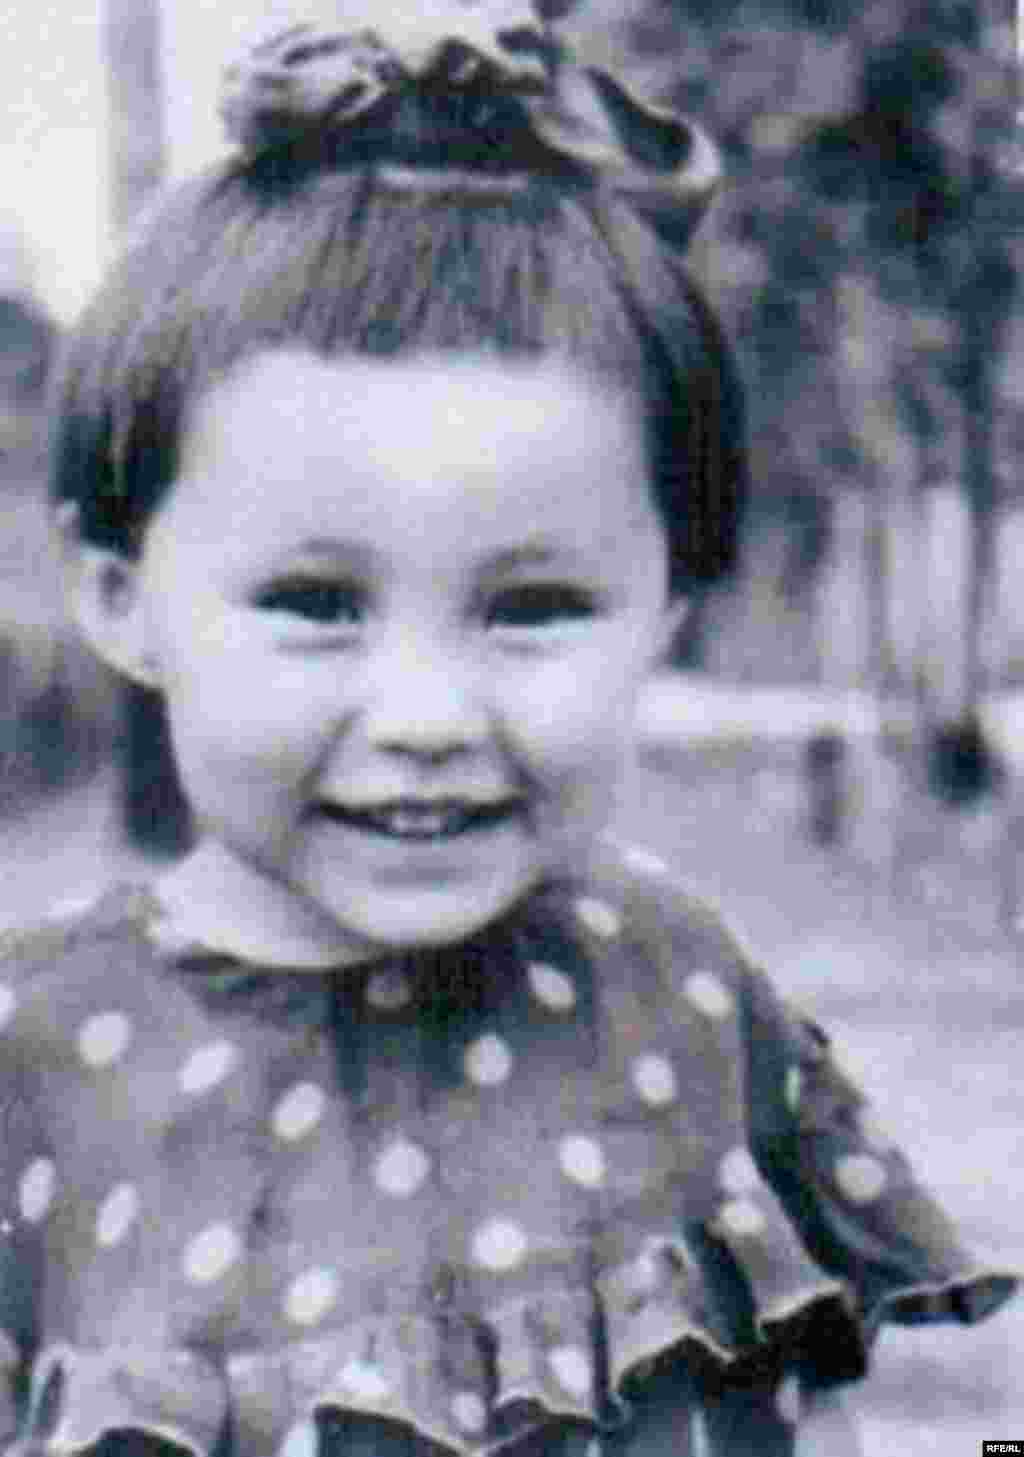 Вице-спикер Жогорку Кенеша Асия Сасыкбаева в детстве.